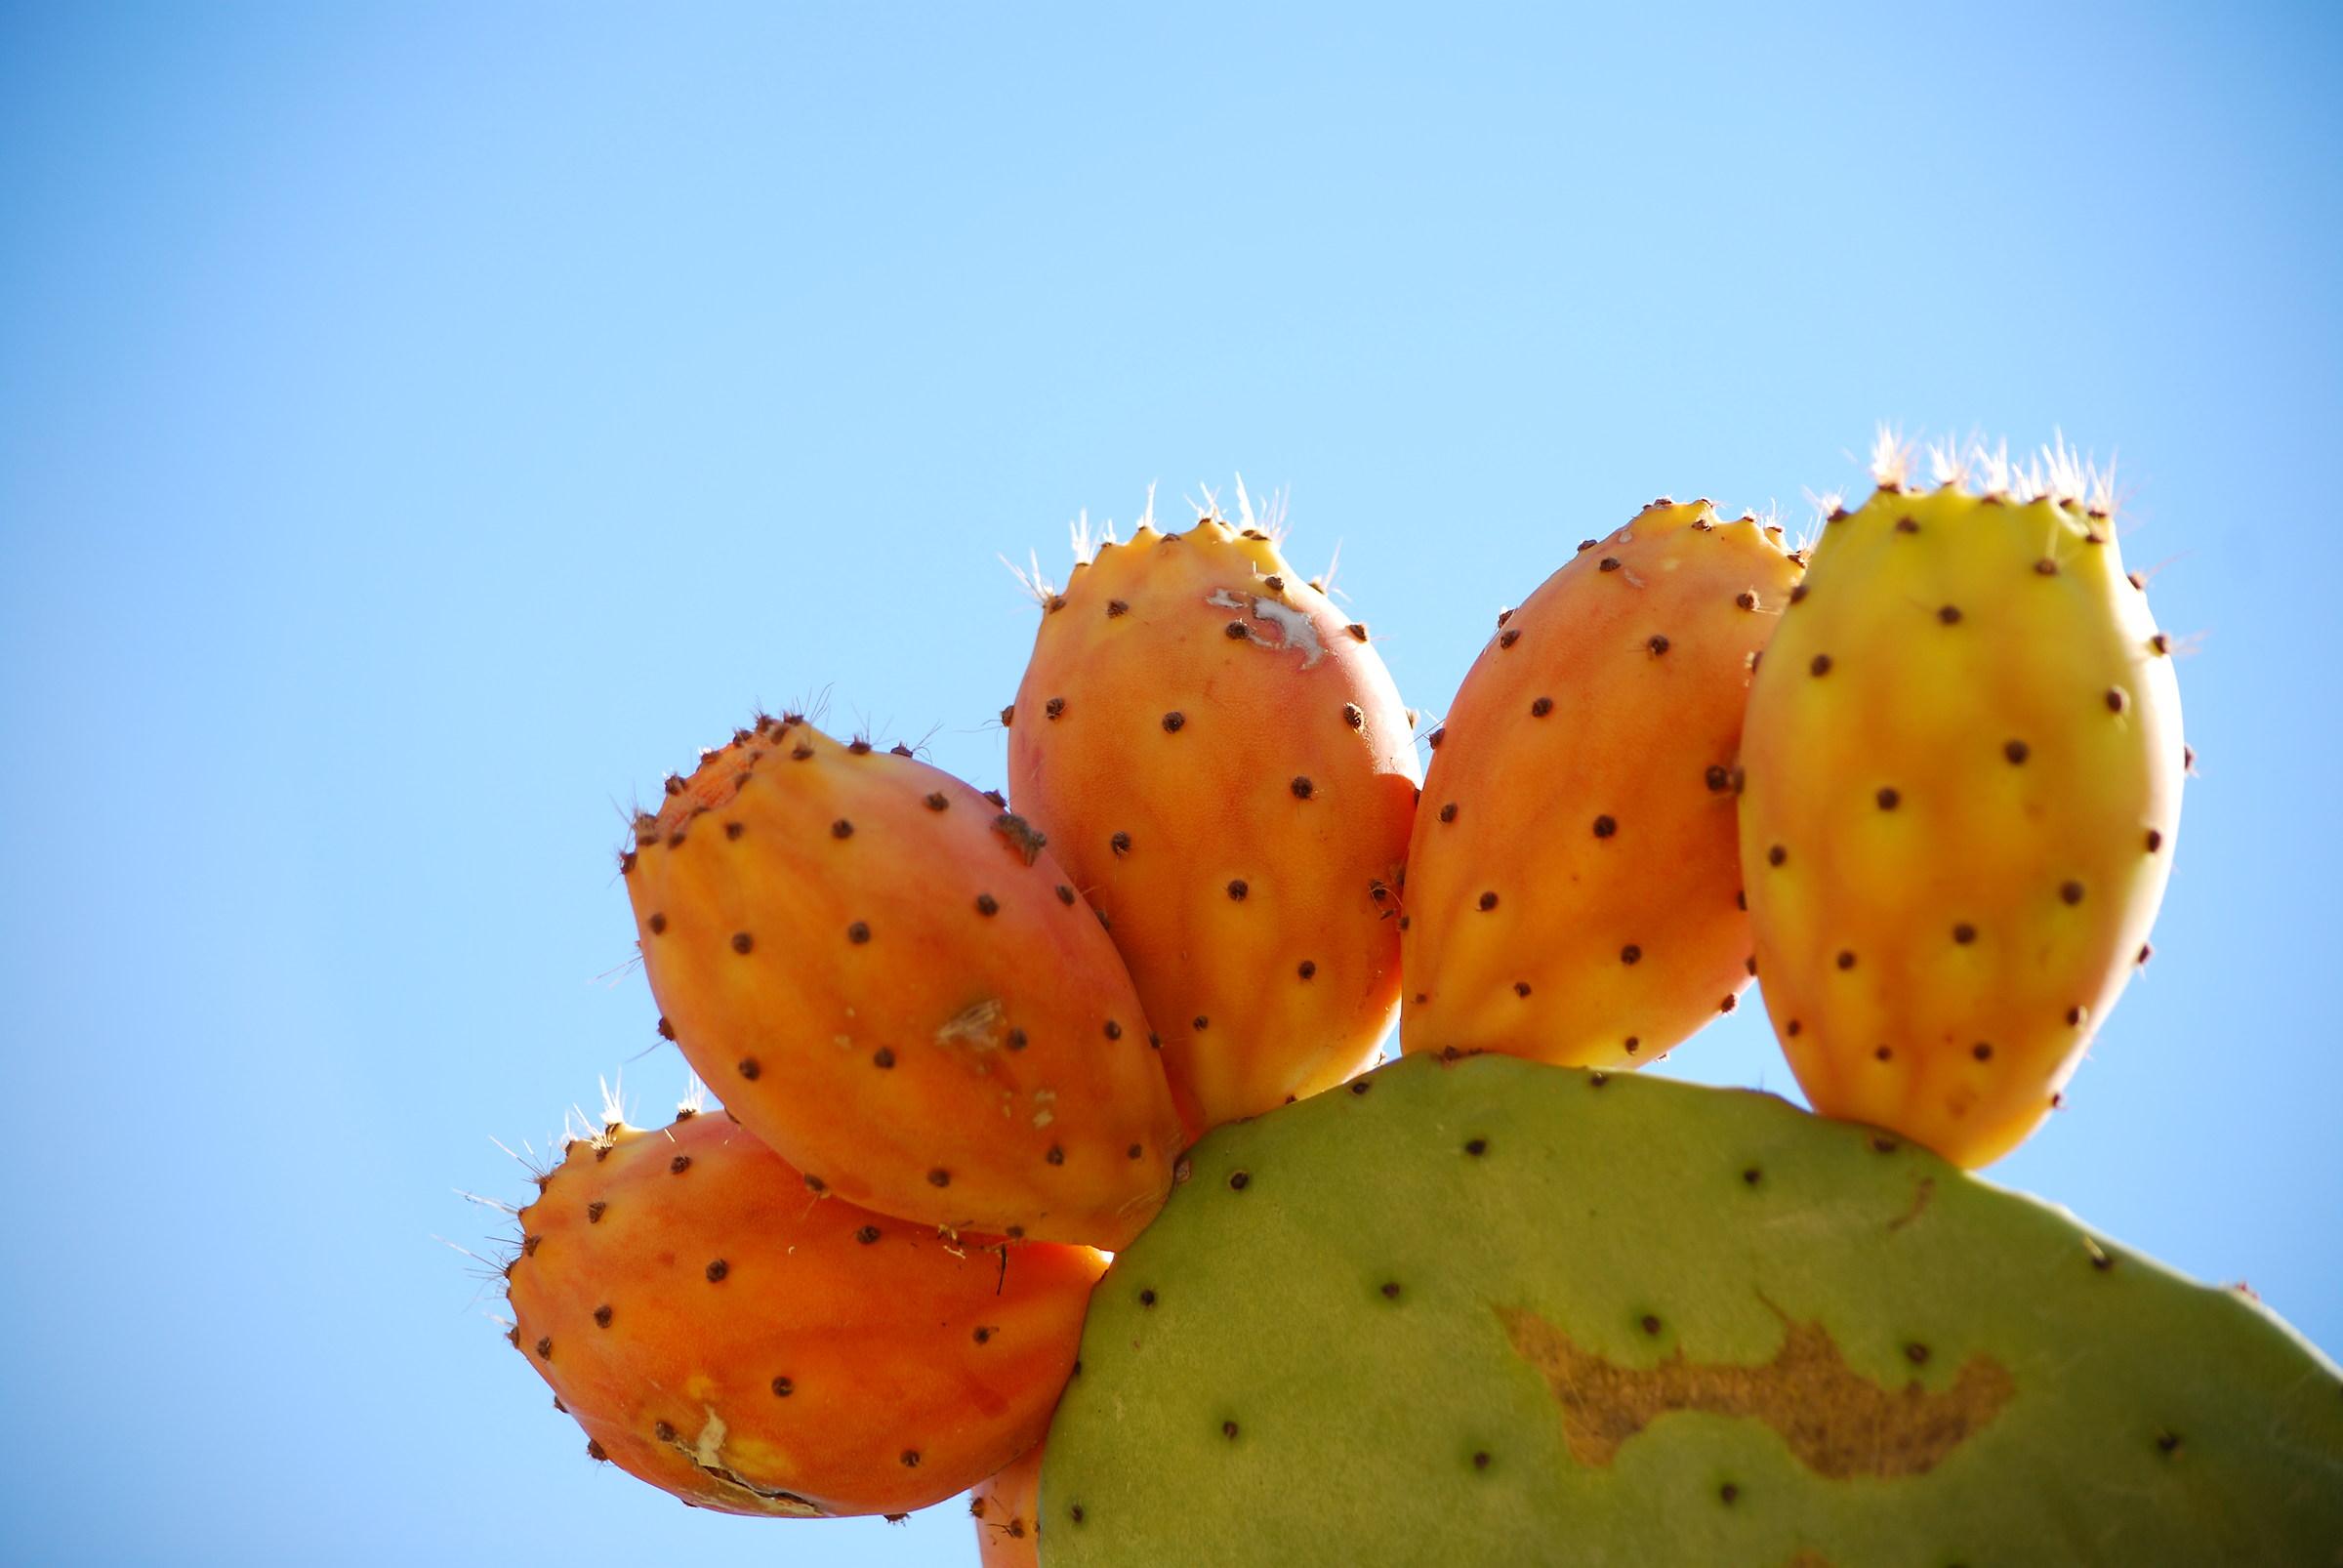 Pungent fruits...